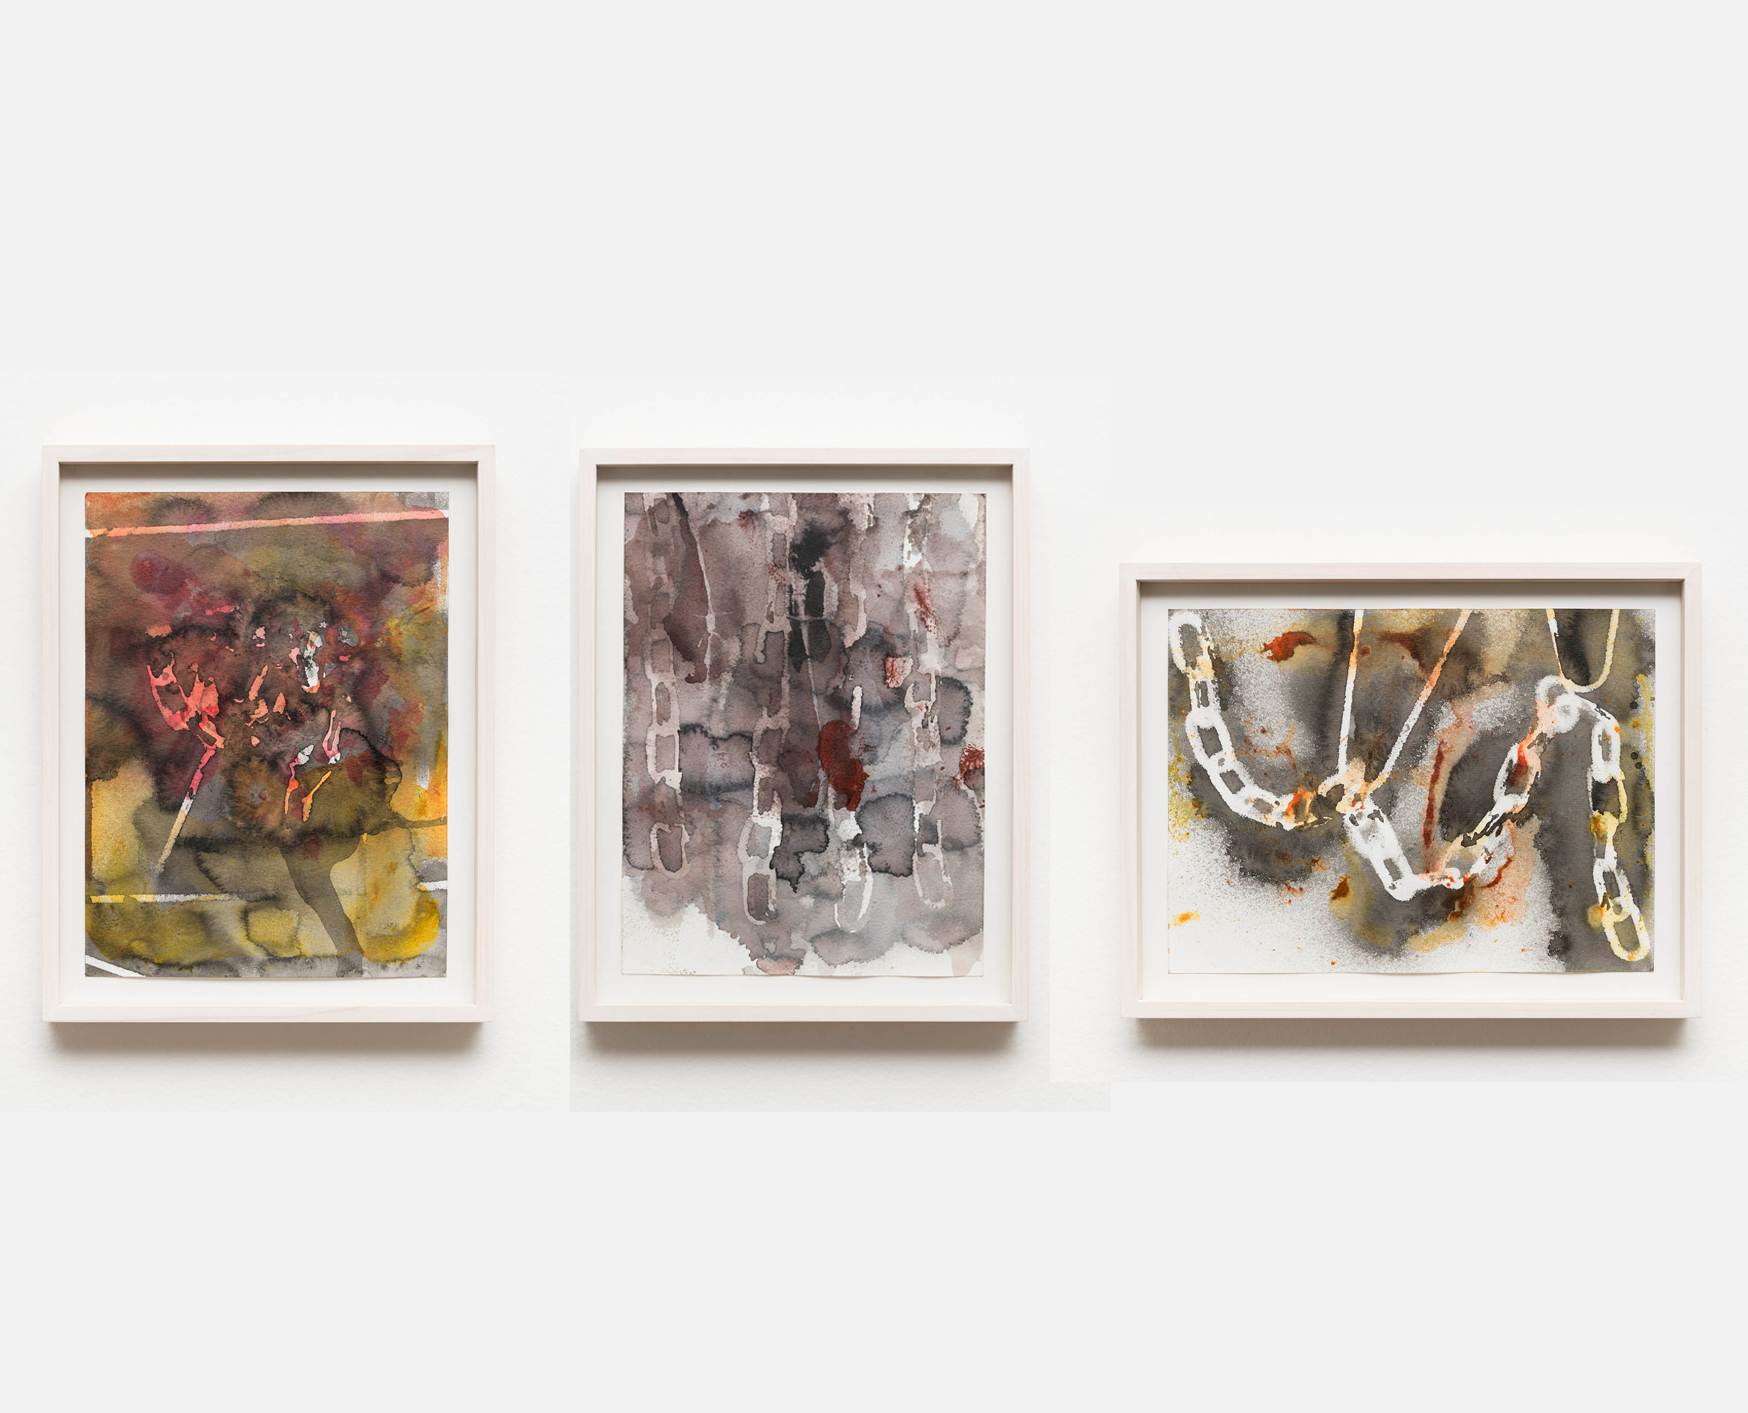 Variações de Correntes em Cor  |  Chain Variations in Color,  2019   aquarela  |  watercolor    22 x 29,7 cm | 8 21/32 x 11 13/16 in